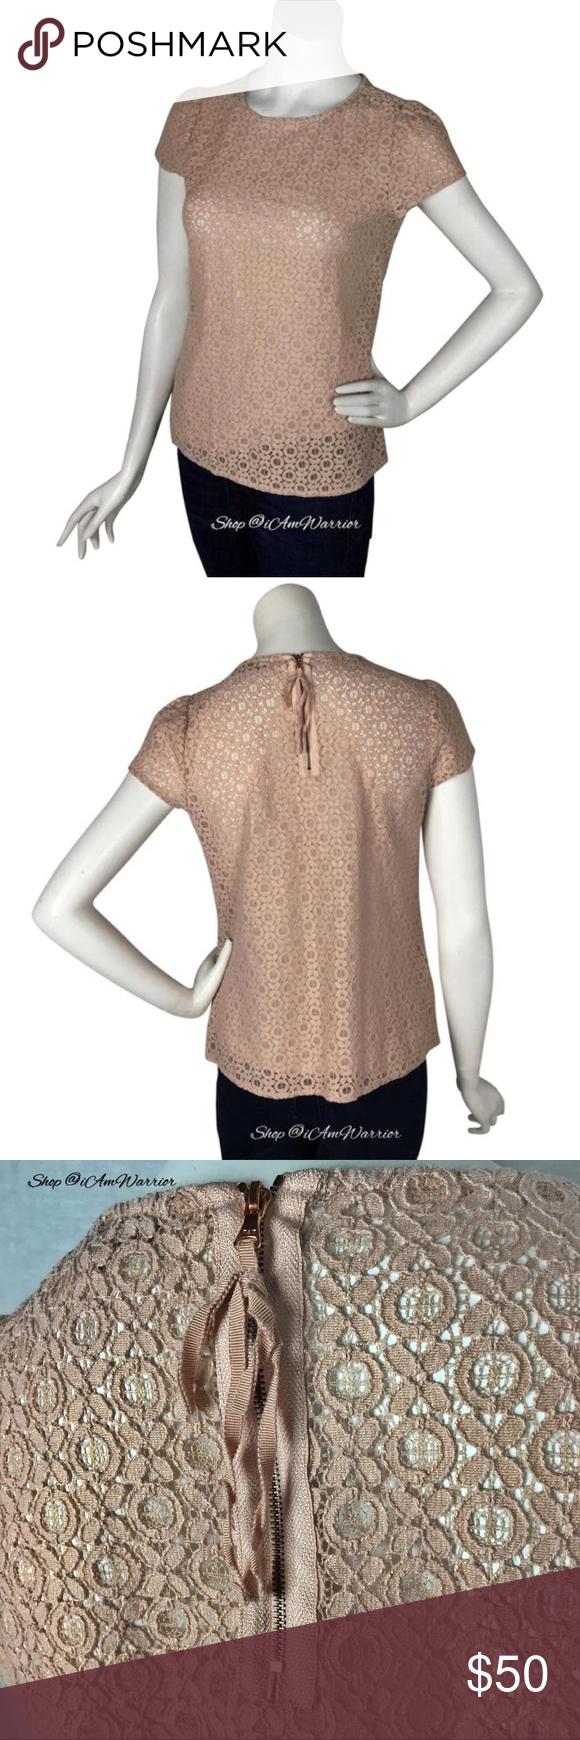 Ann Taylor Loft blush rose gold metallic lace top Pretty semi sheer lace  Loft top 57782c88f